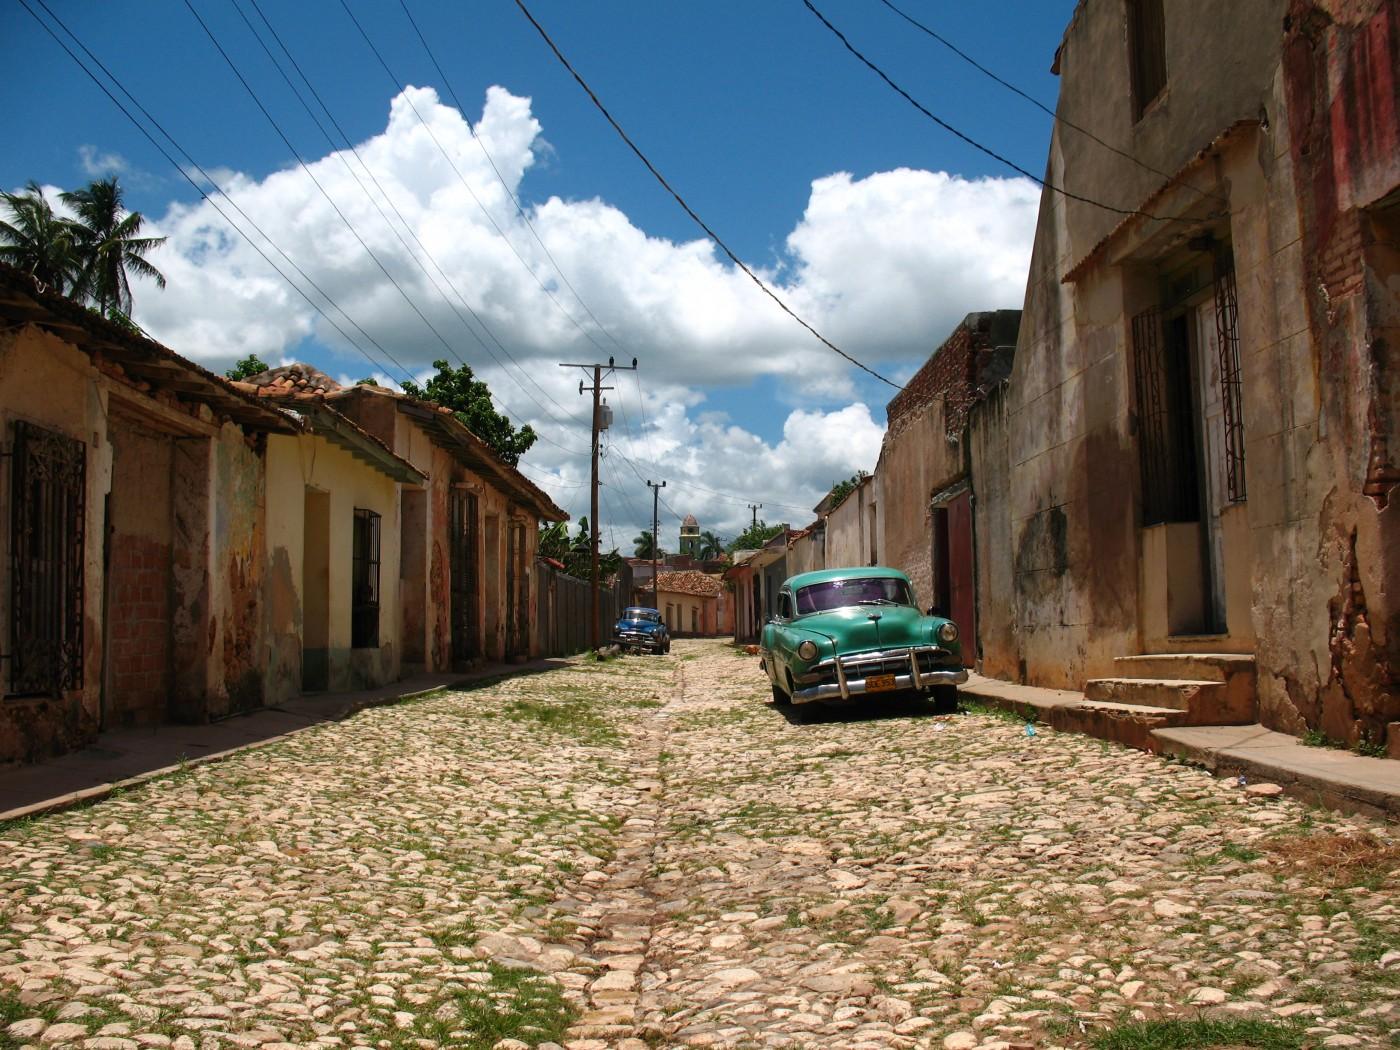 Trinidad, Cuba - Per Wikimedia